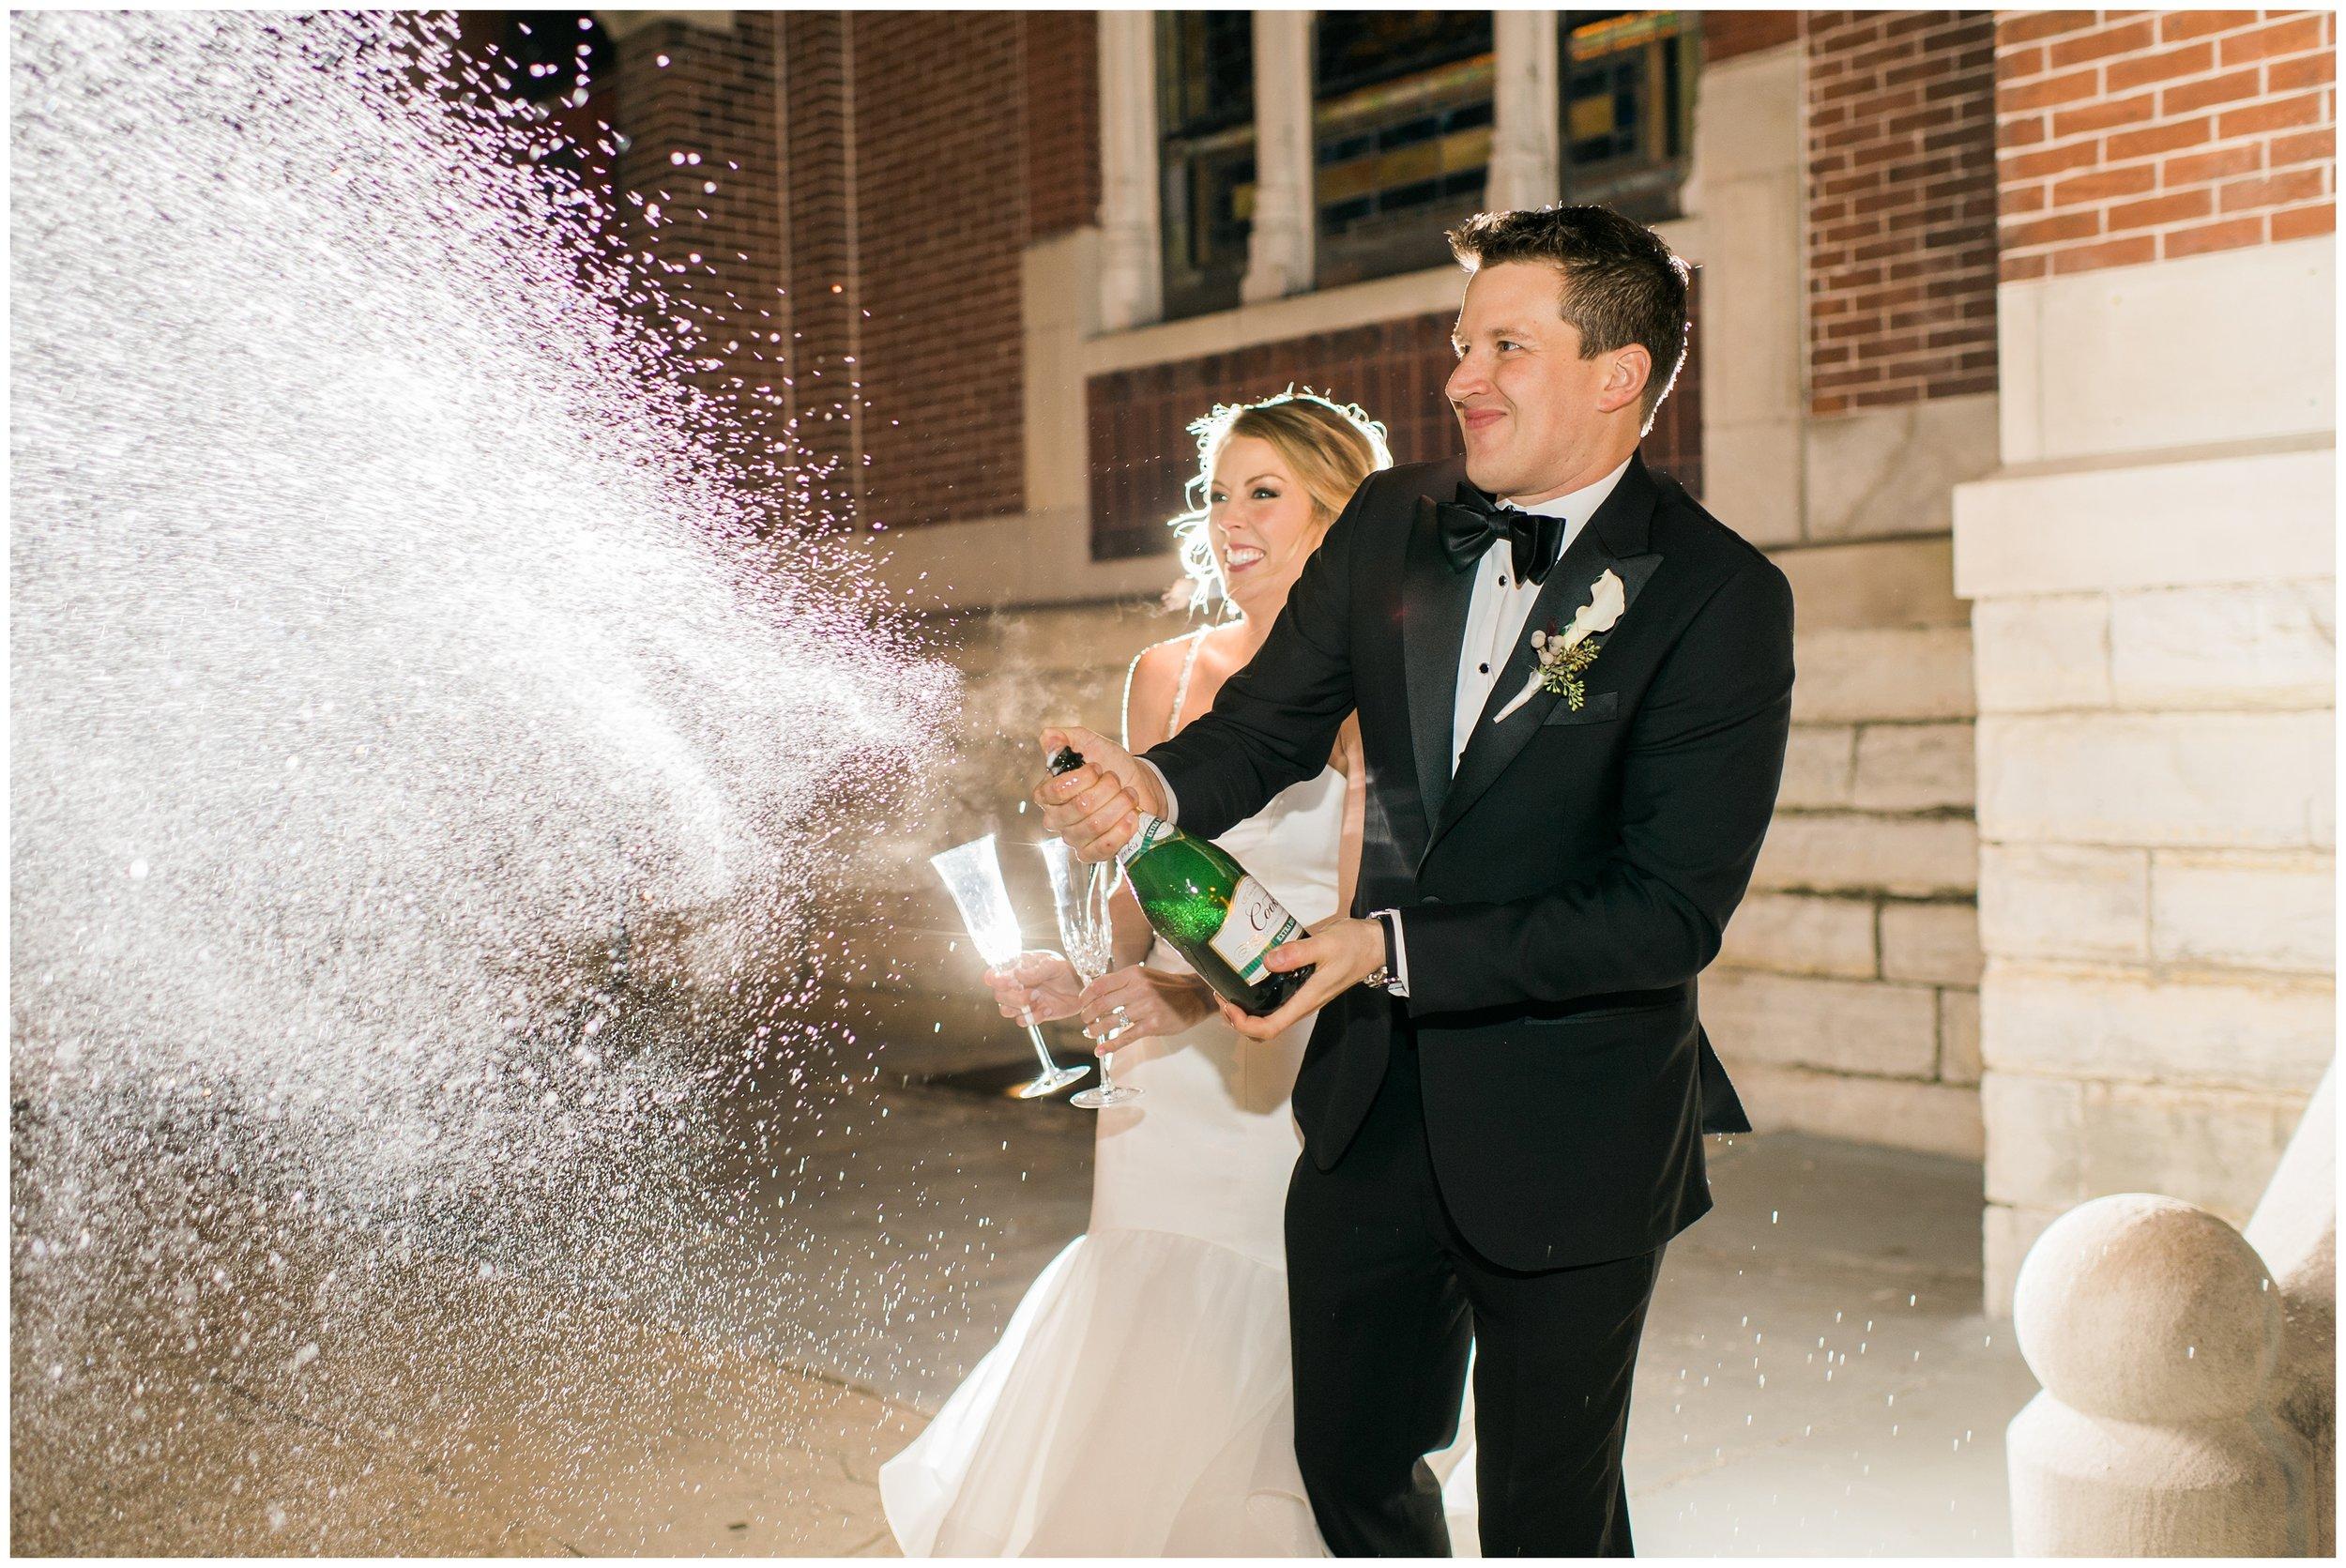 Rebecca_Bridges_Photography_Indianapolis_Wedding_Photographer_5856.jpg